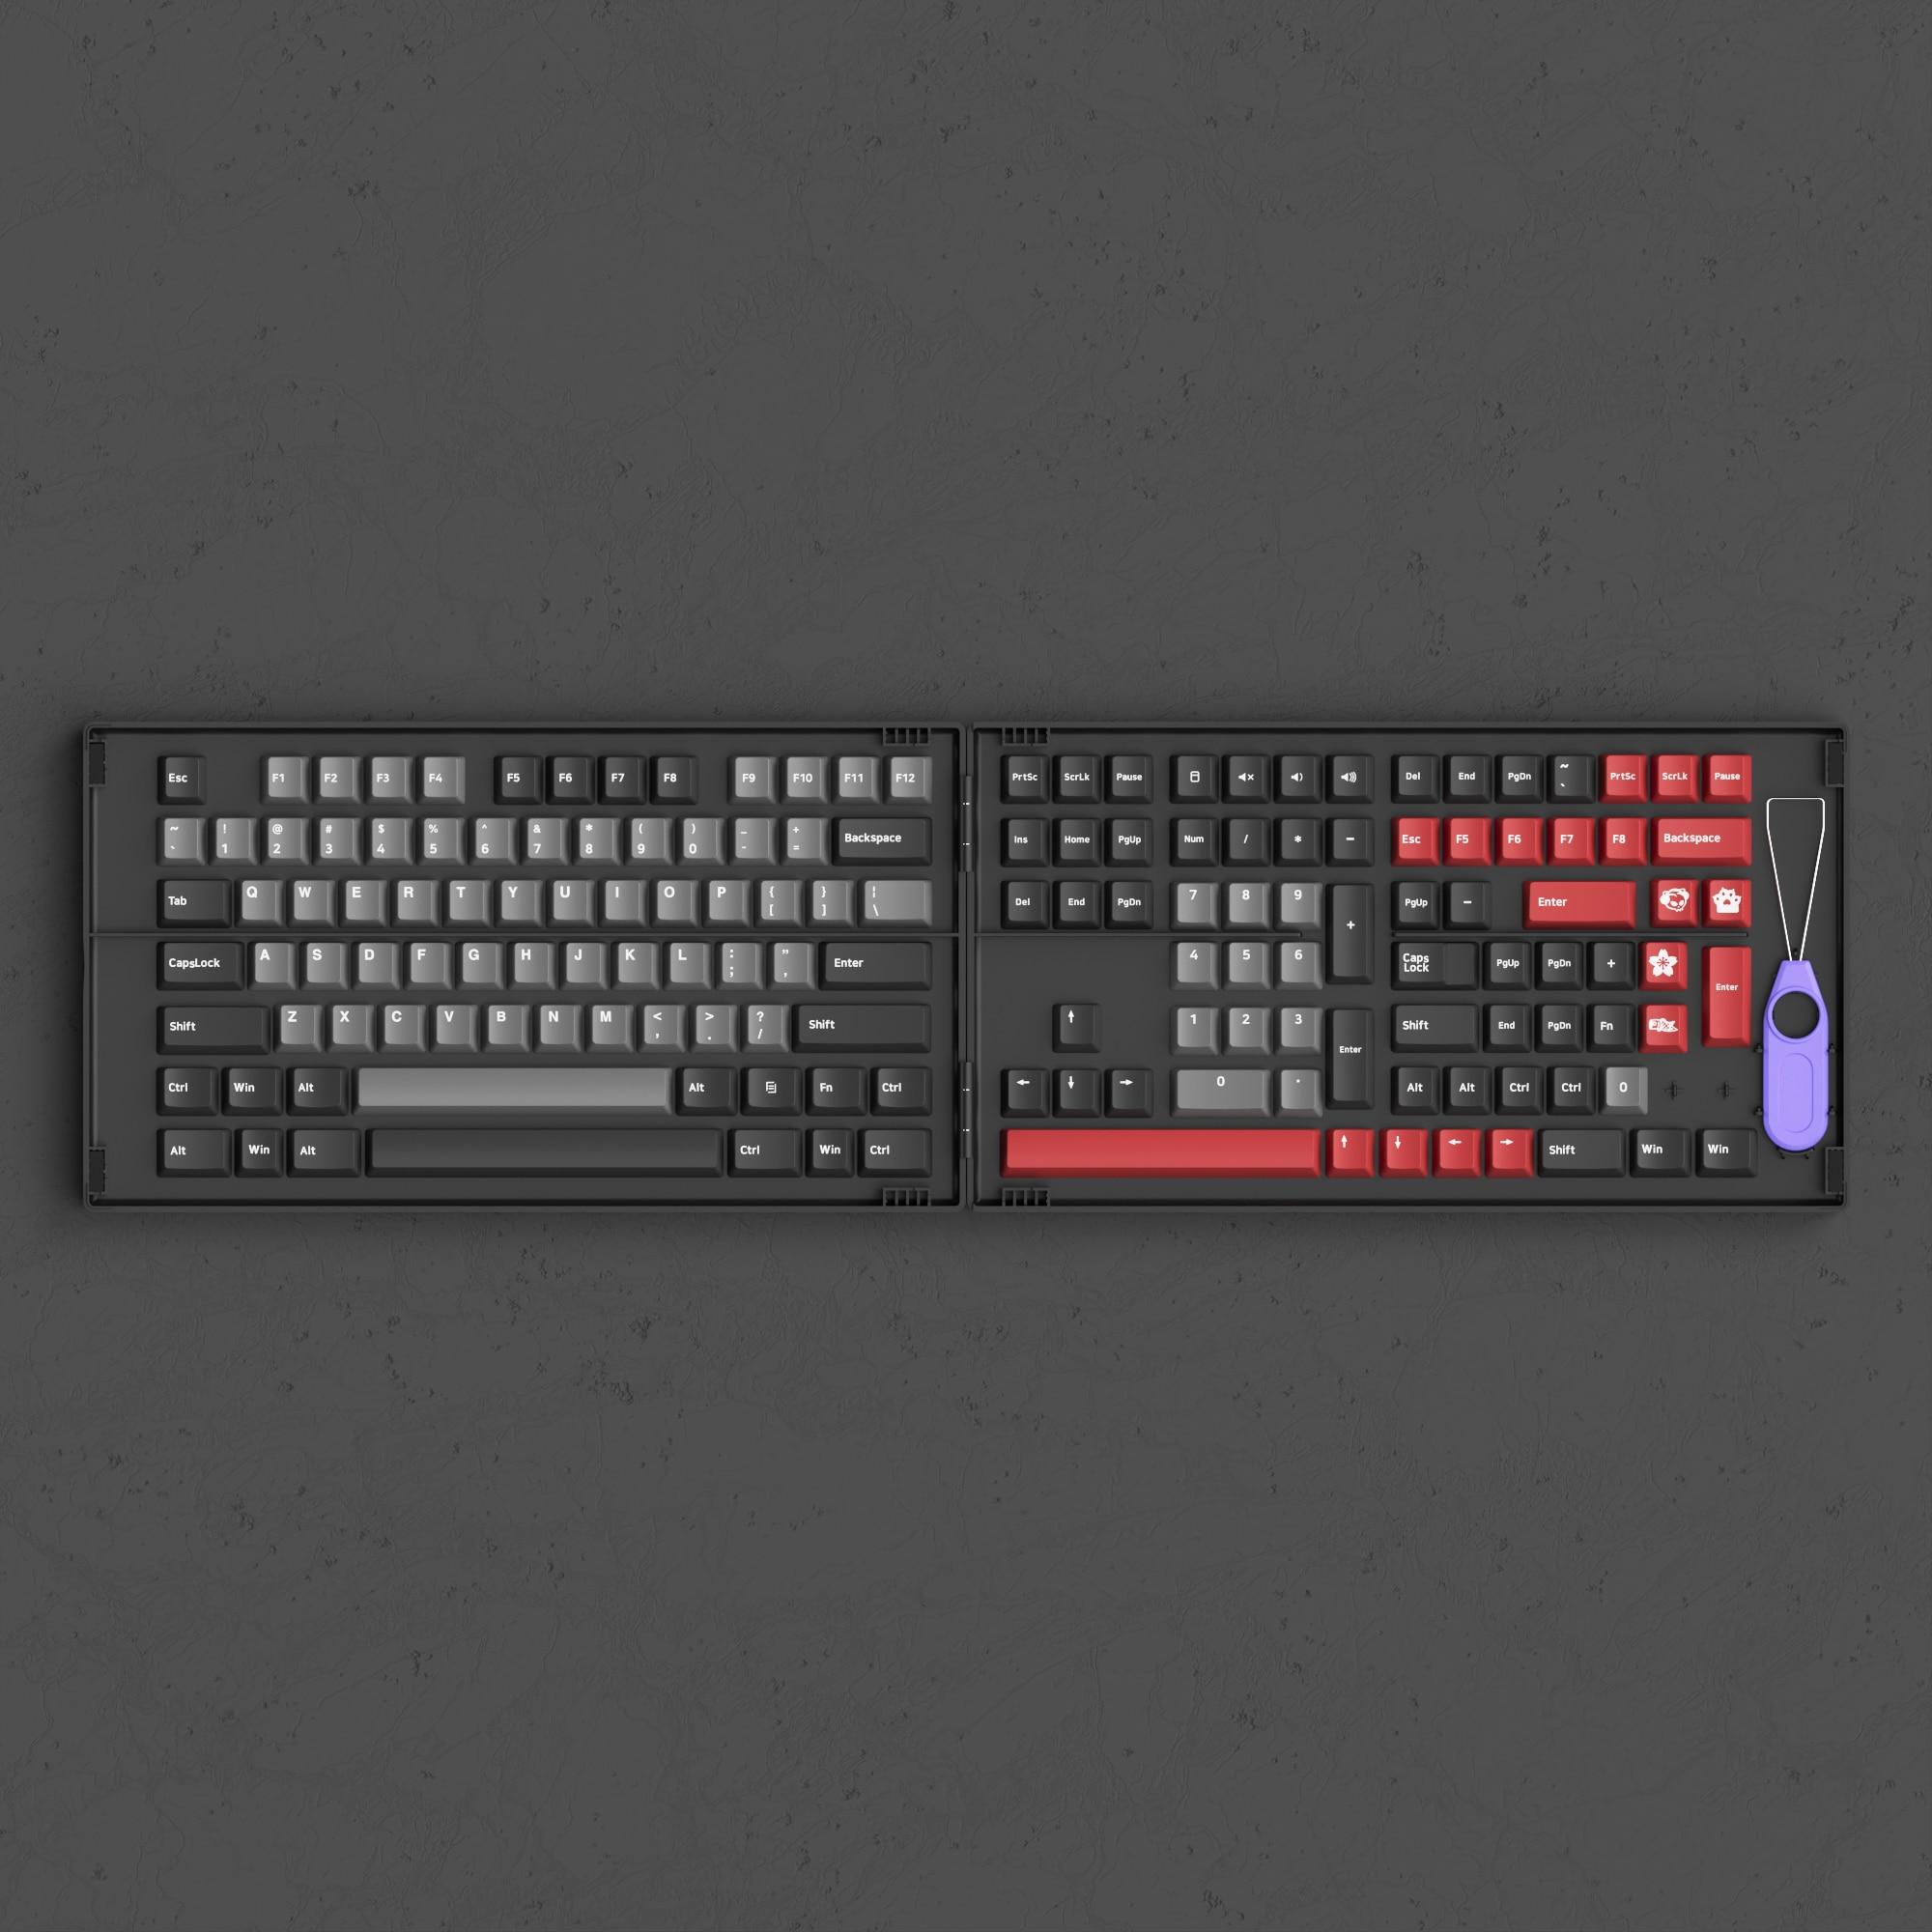 AKKO Psittacus 157 مفاتيح مزدوجة النار PBT الكرز الشخصي مجموعة أغطية مفاتيح كاملة ، مع صندوق تخزين مخصص لاستبدال لوحة المفاتيح الميكانيكية